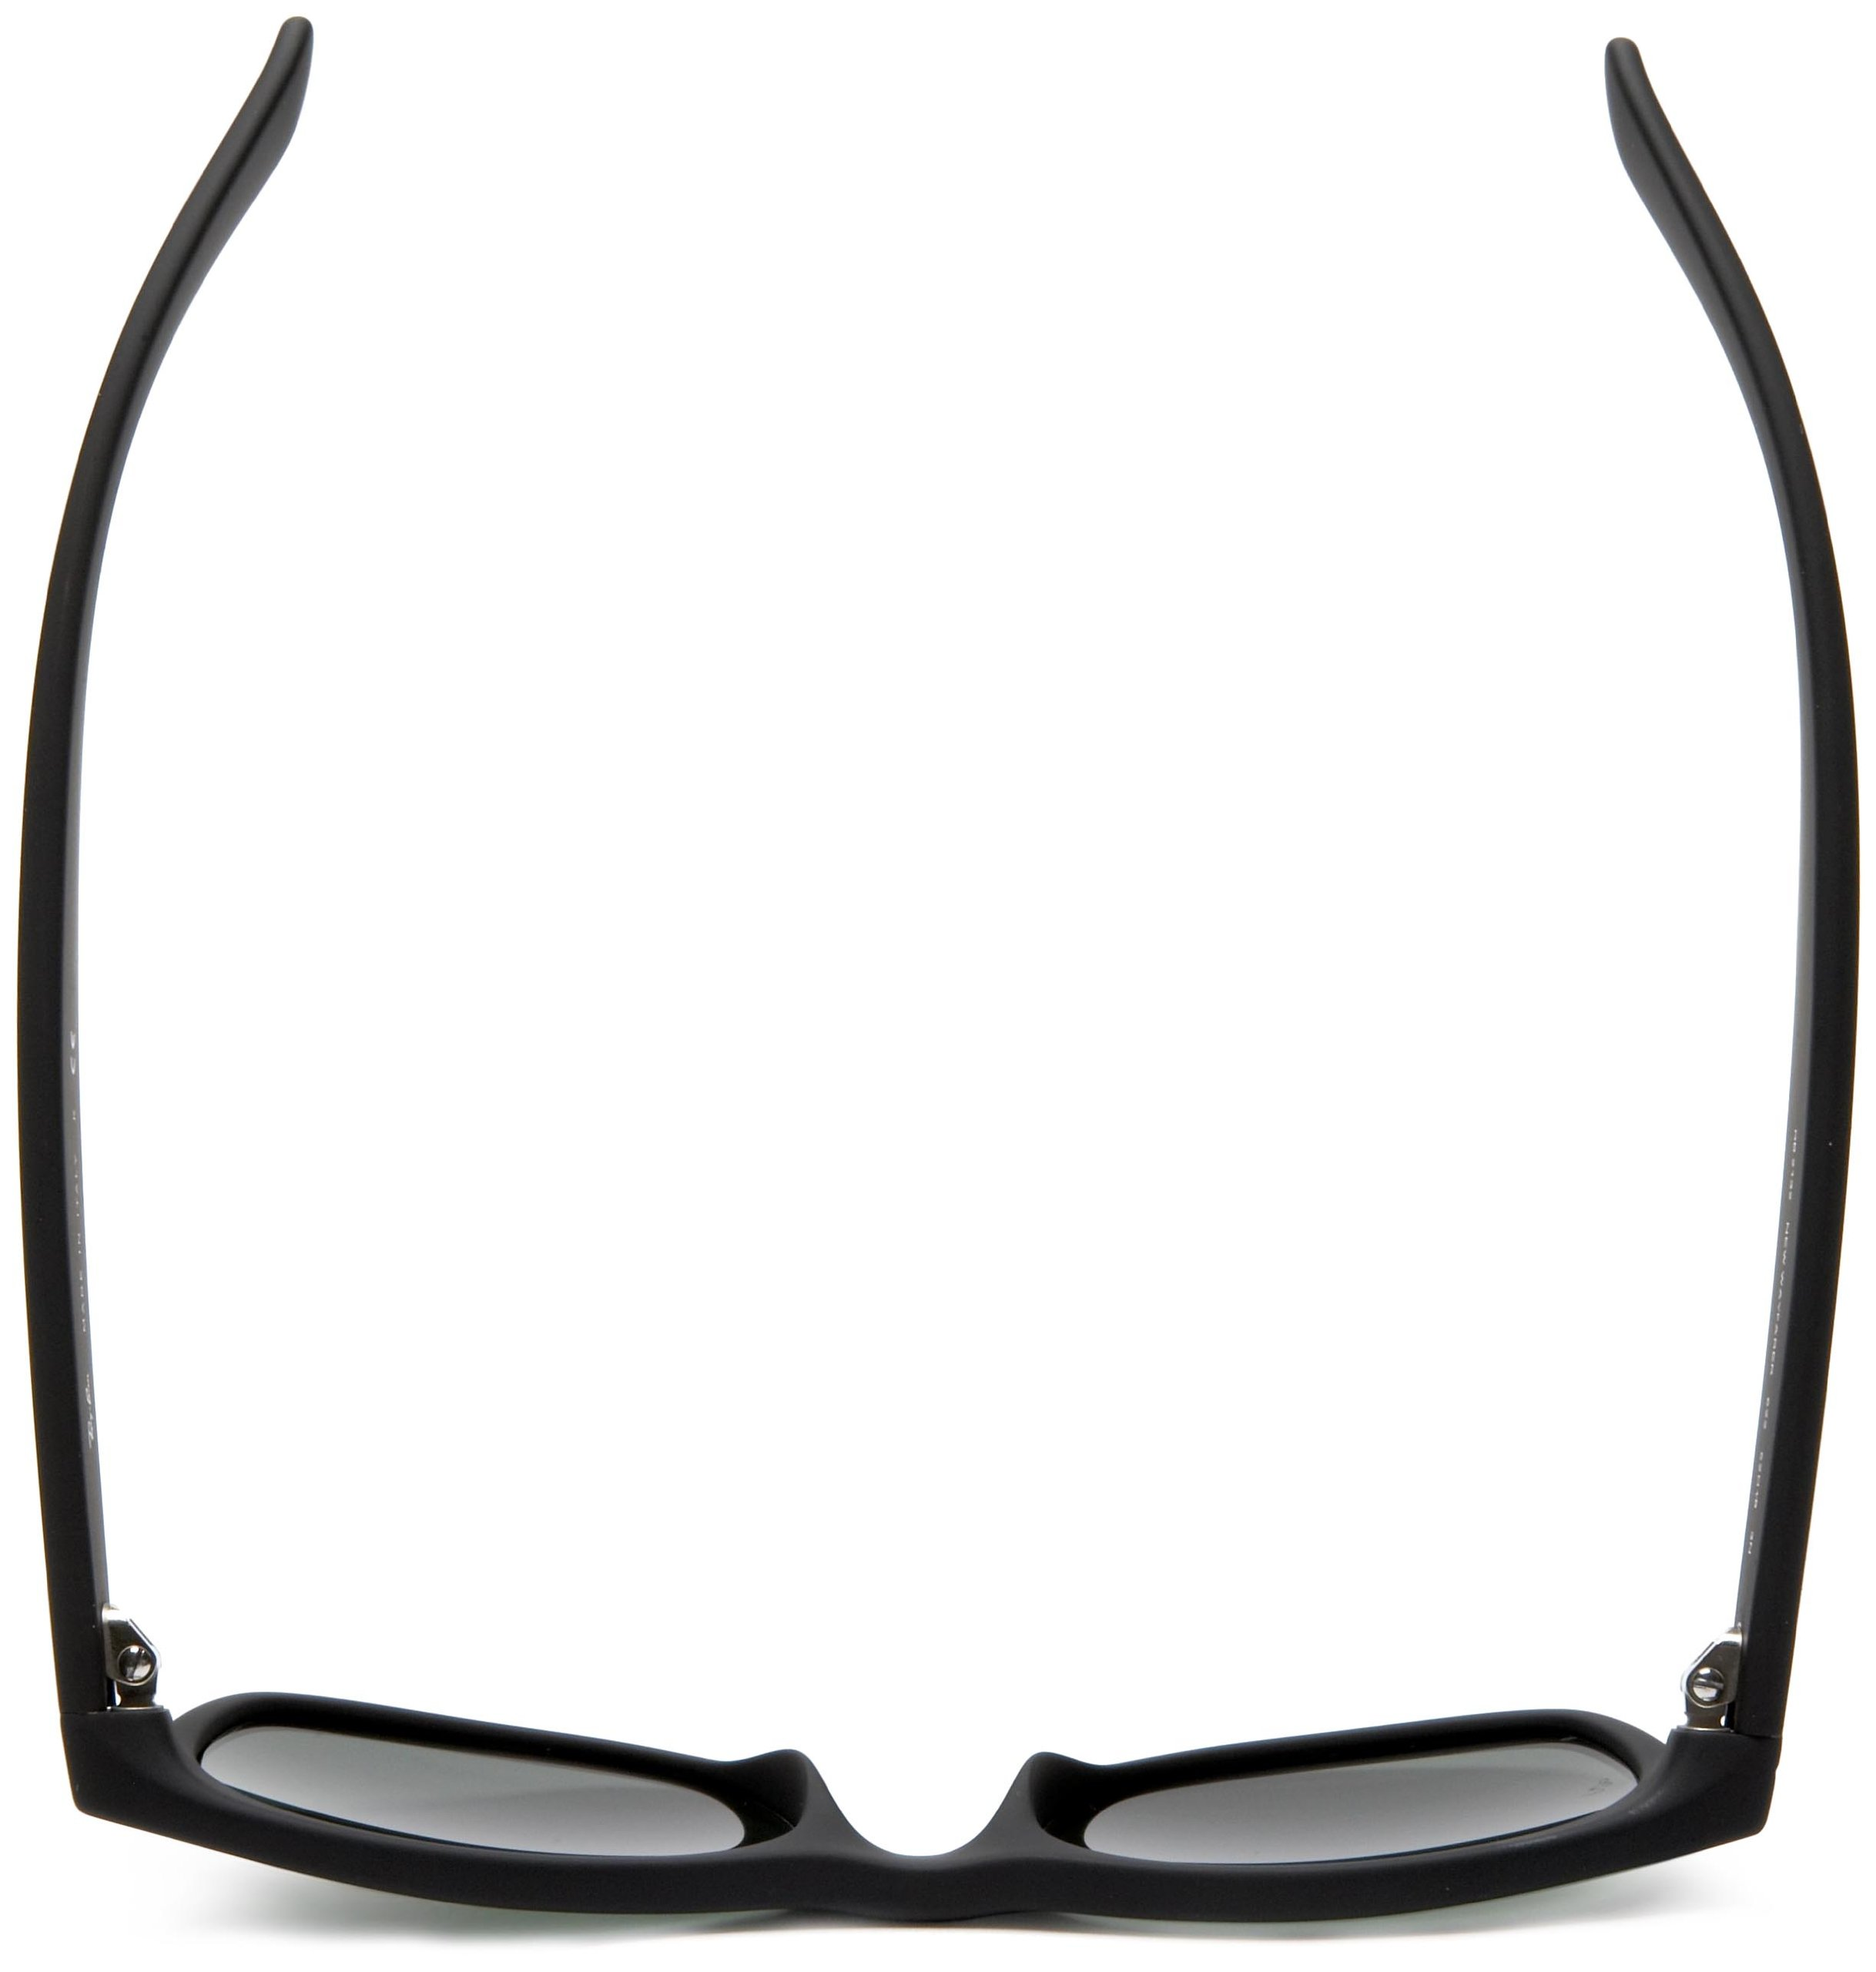 Ray-Ban, RB2132 Wayfarer Sunglasses, Unisex Ray-Ban Glasses, 100% UV Protection, Polarized Wayfarer, Reduce Eye Strain, Lightweight Plastic Frame, Prescription-Ready Lenses, 58 mm Frame by Ray-Ban (Image #5)